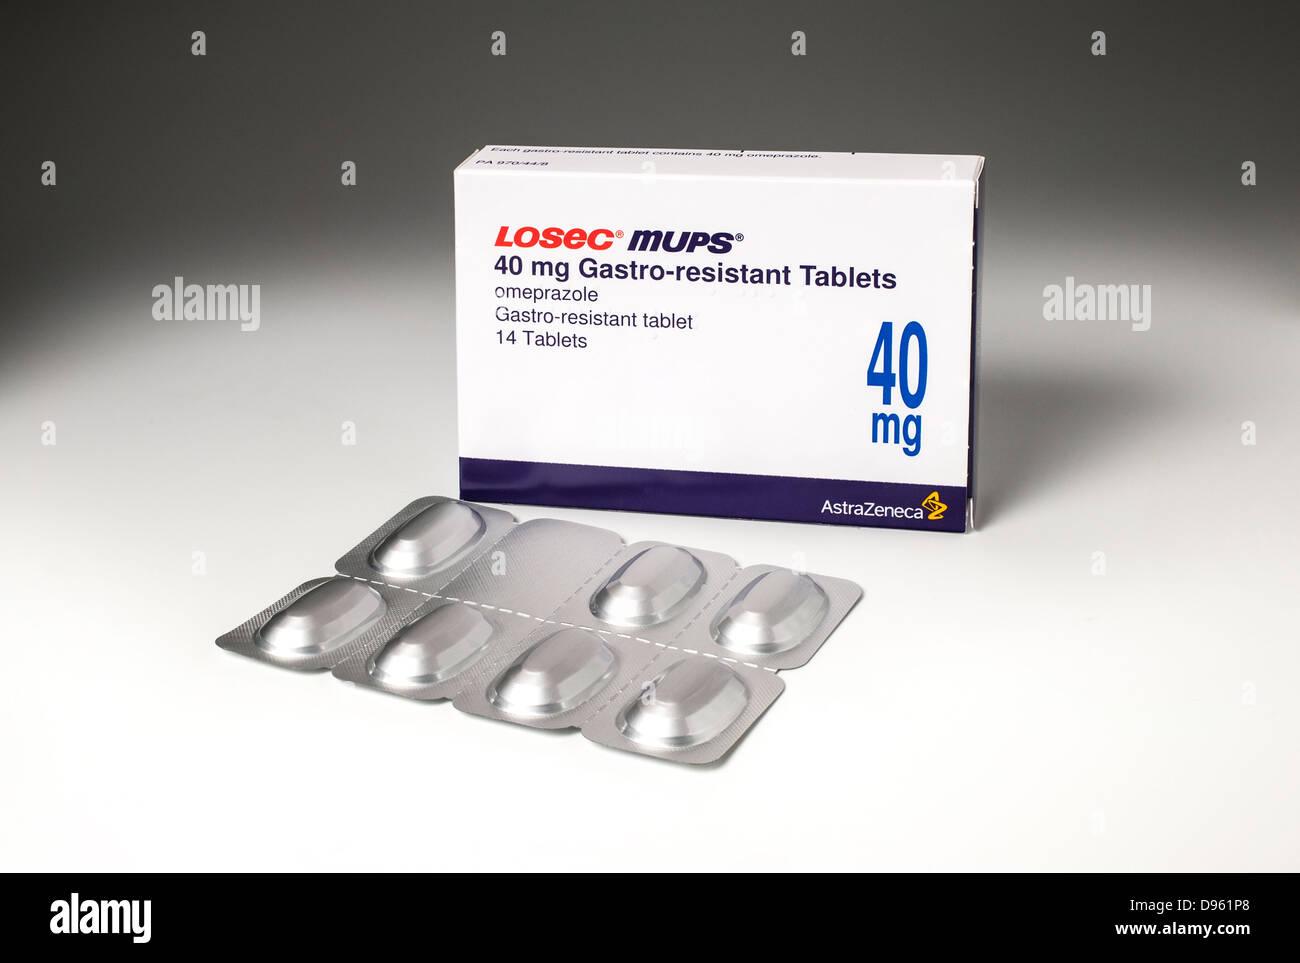 Losec Tabletten - Protonenpumpenhemmer Omeprazol Medikamente verlangsamt oder verhindert die Produktion von Magensäure Stockbild